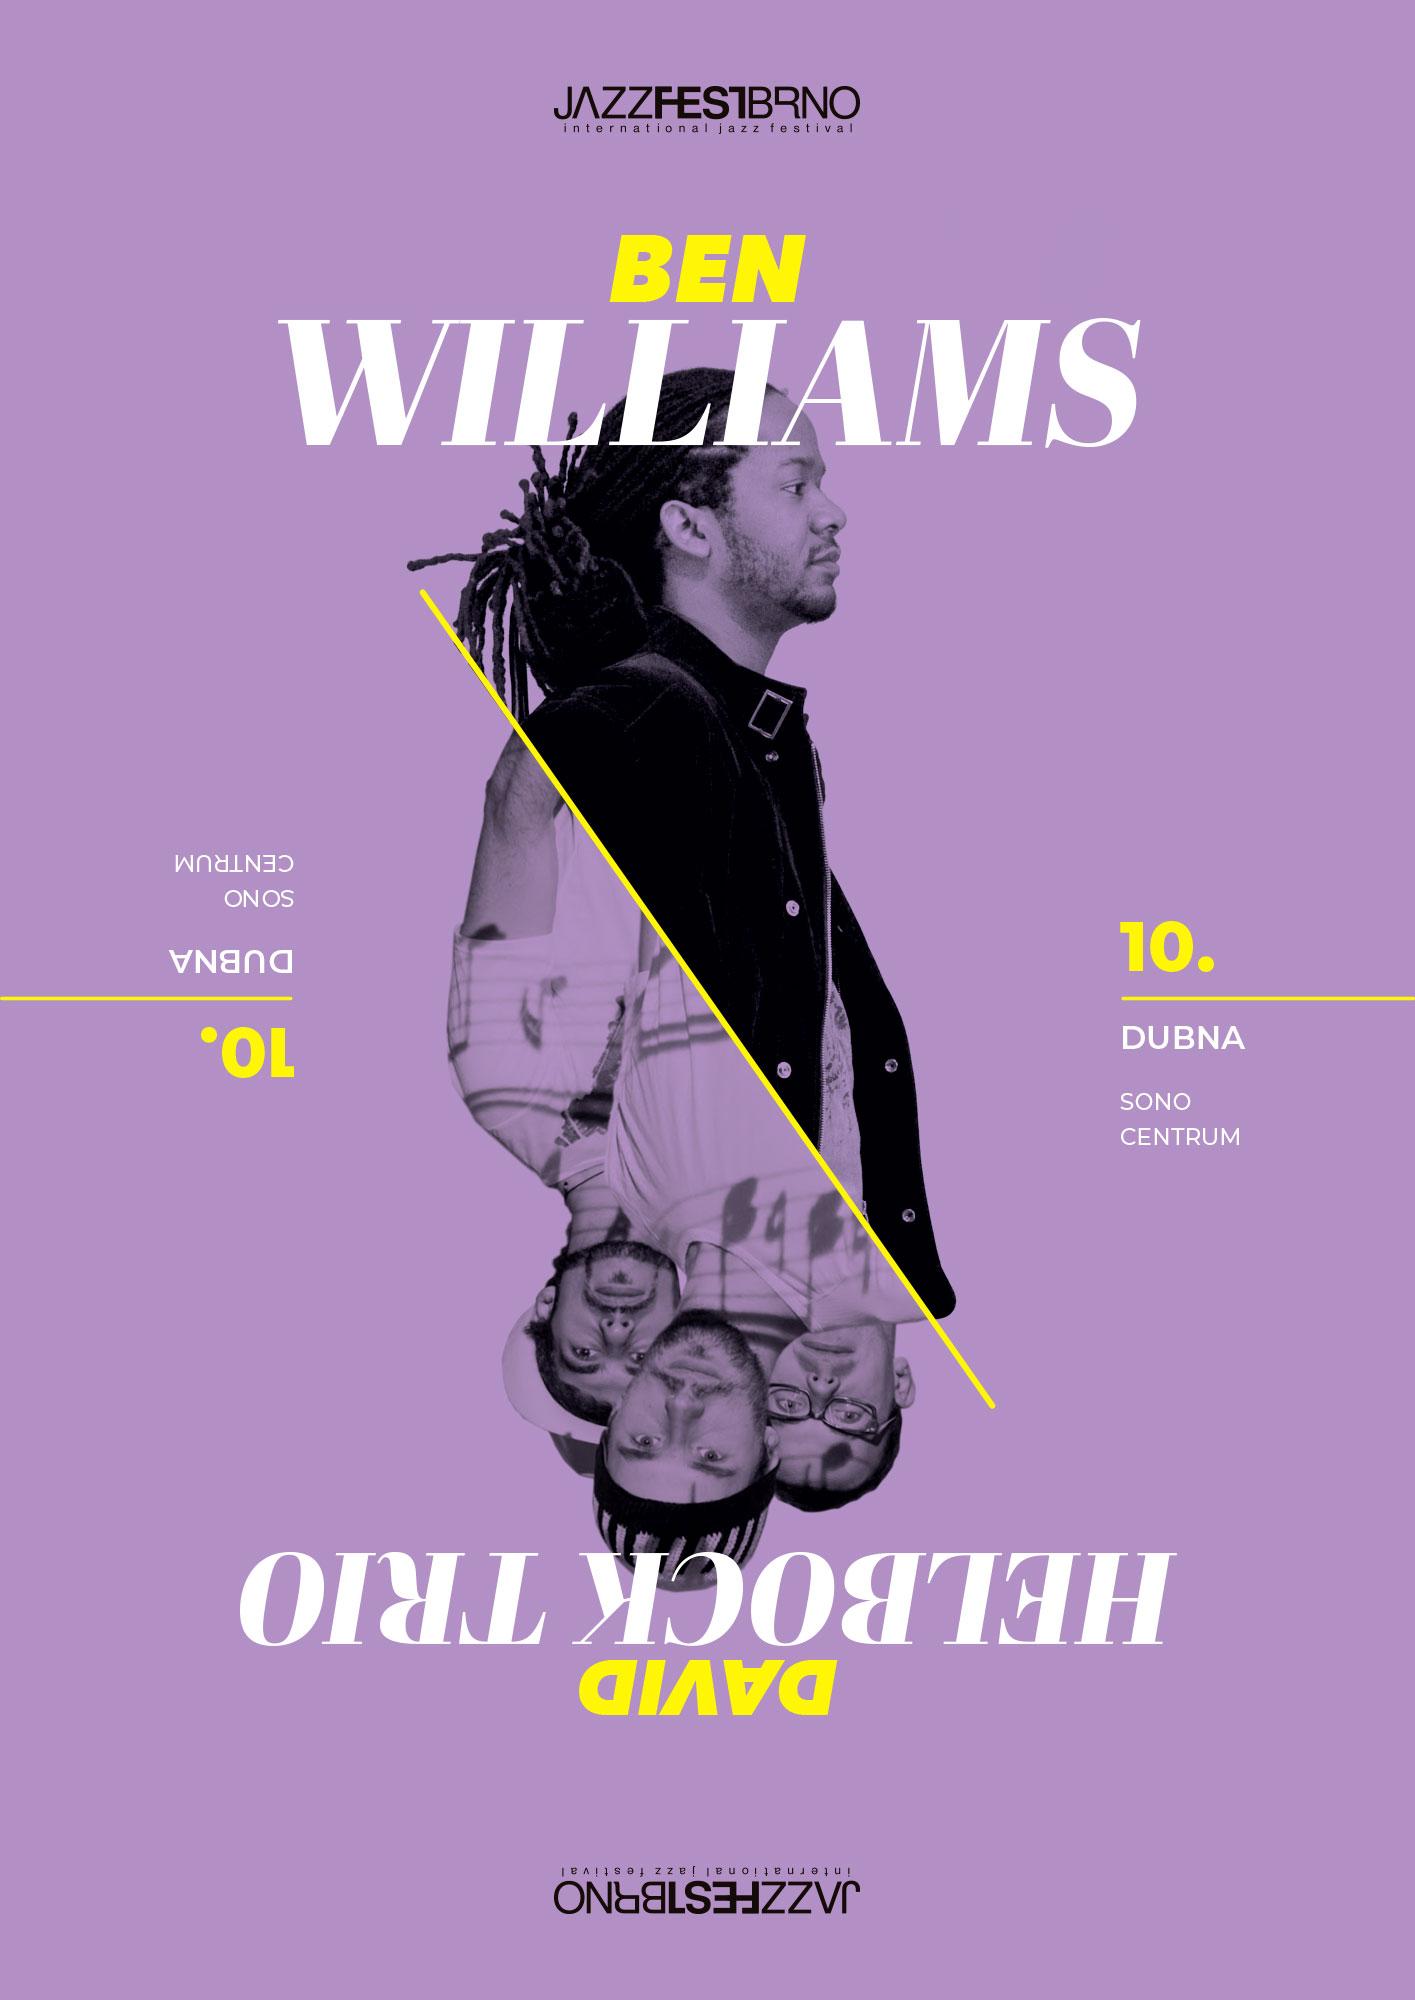 Jazzfestbrno 2015 - Ben Williams & David Helbock Trio